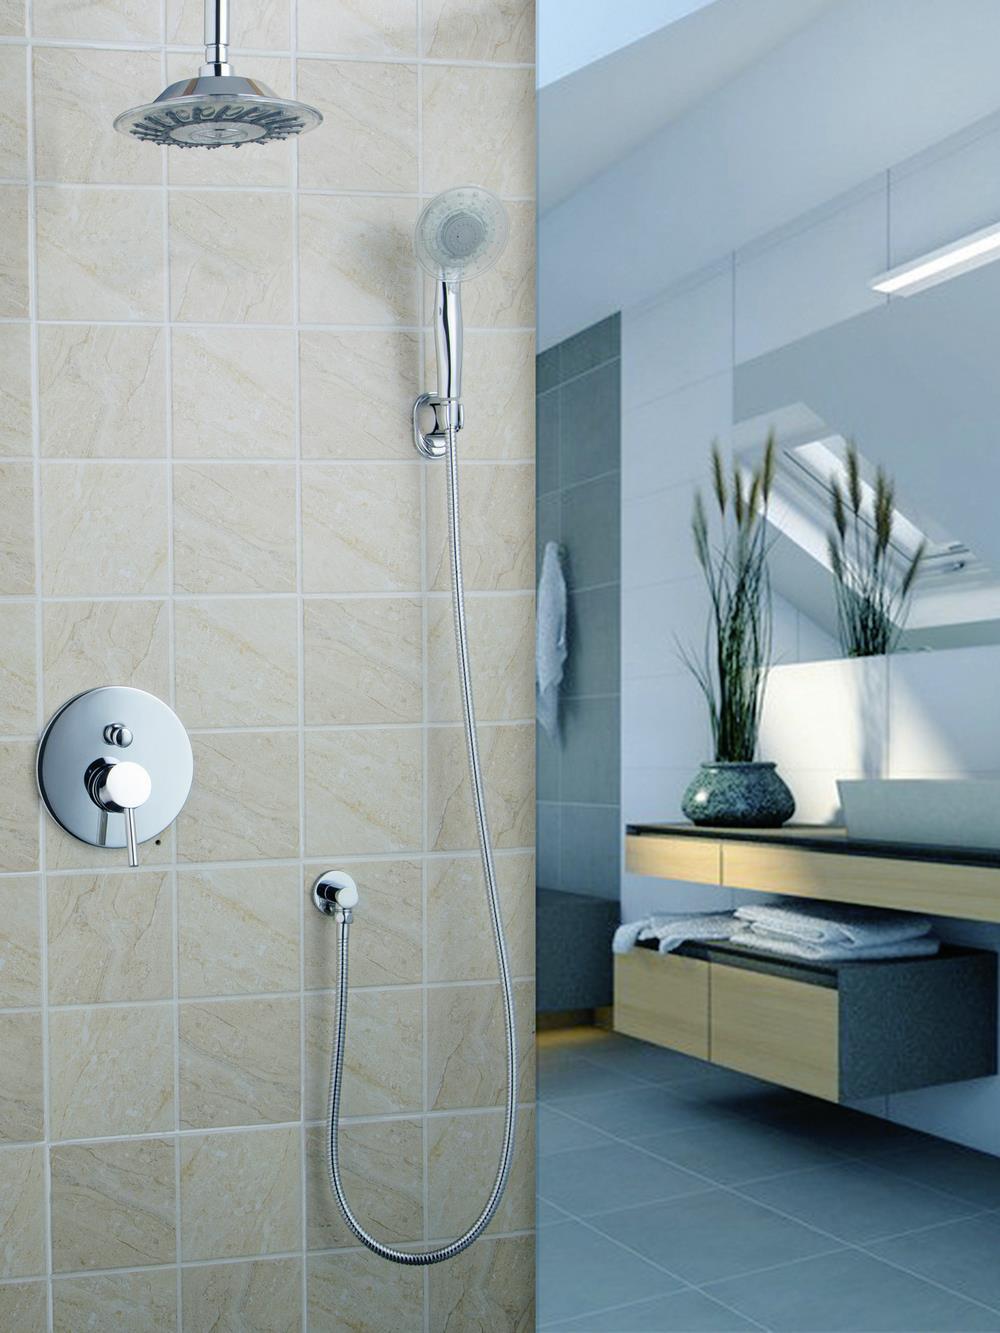 Ceiling Wall 8 Shower Head Bathroom Rainfall 50243-22A Bath Tub Chrome Brass Sink Faucets,Mixers & Tap Shower Set Torneira 8 chrome bathroom faucets bath shower tub led rainfall shower head w hand spray shower mixer set faucets